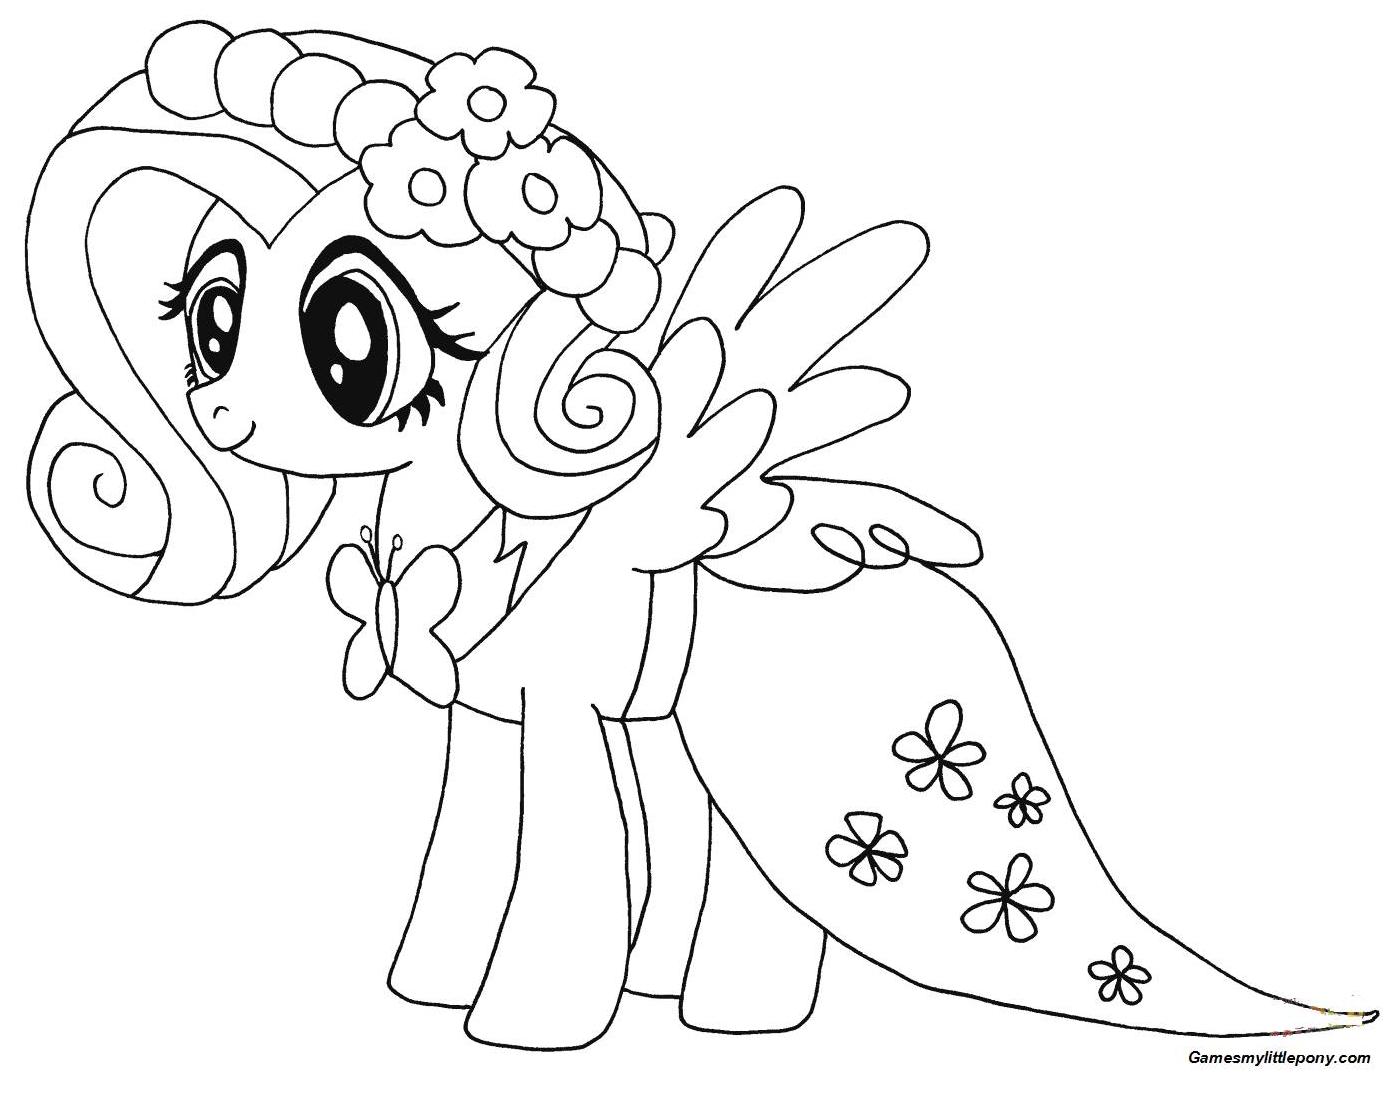 My Little Pony Fluttershy from My Little Pony